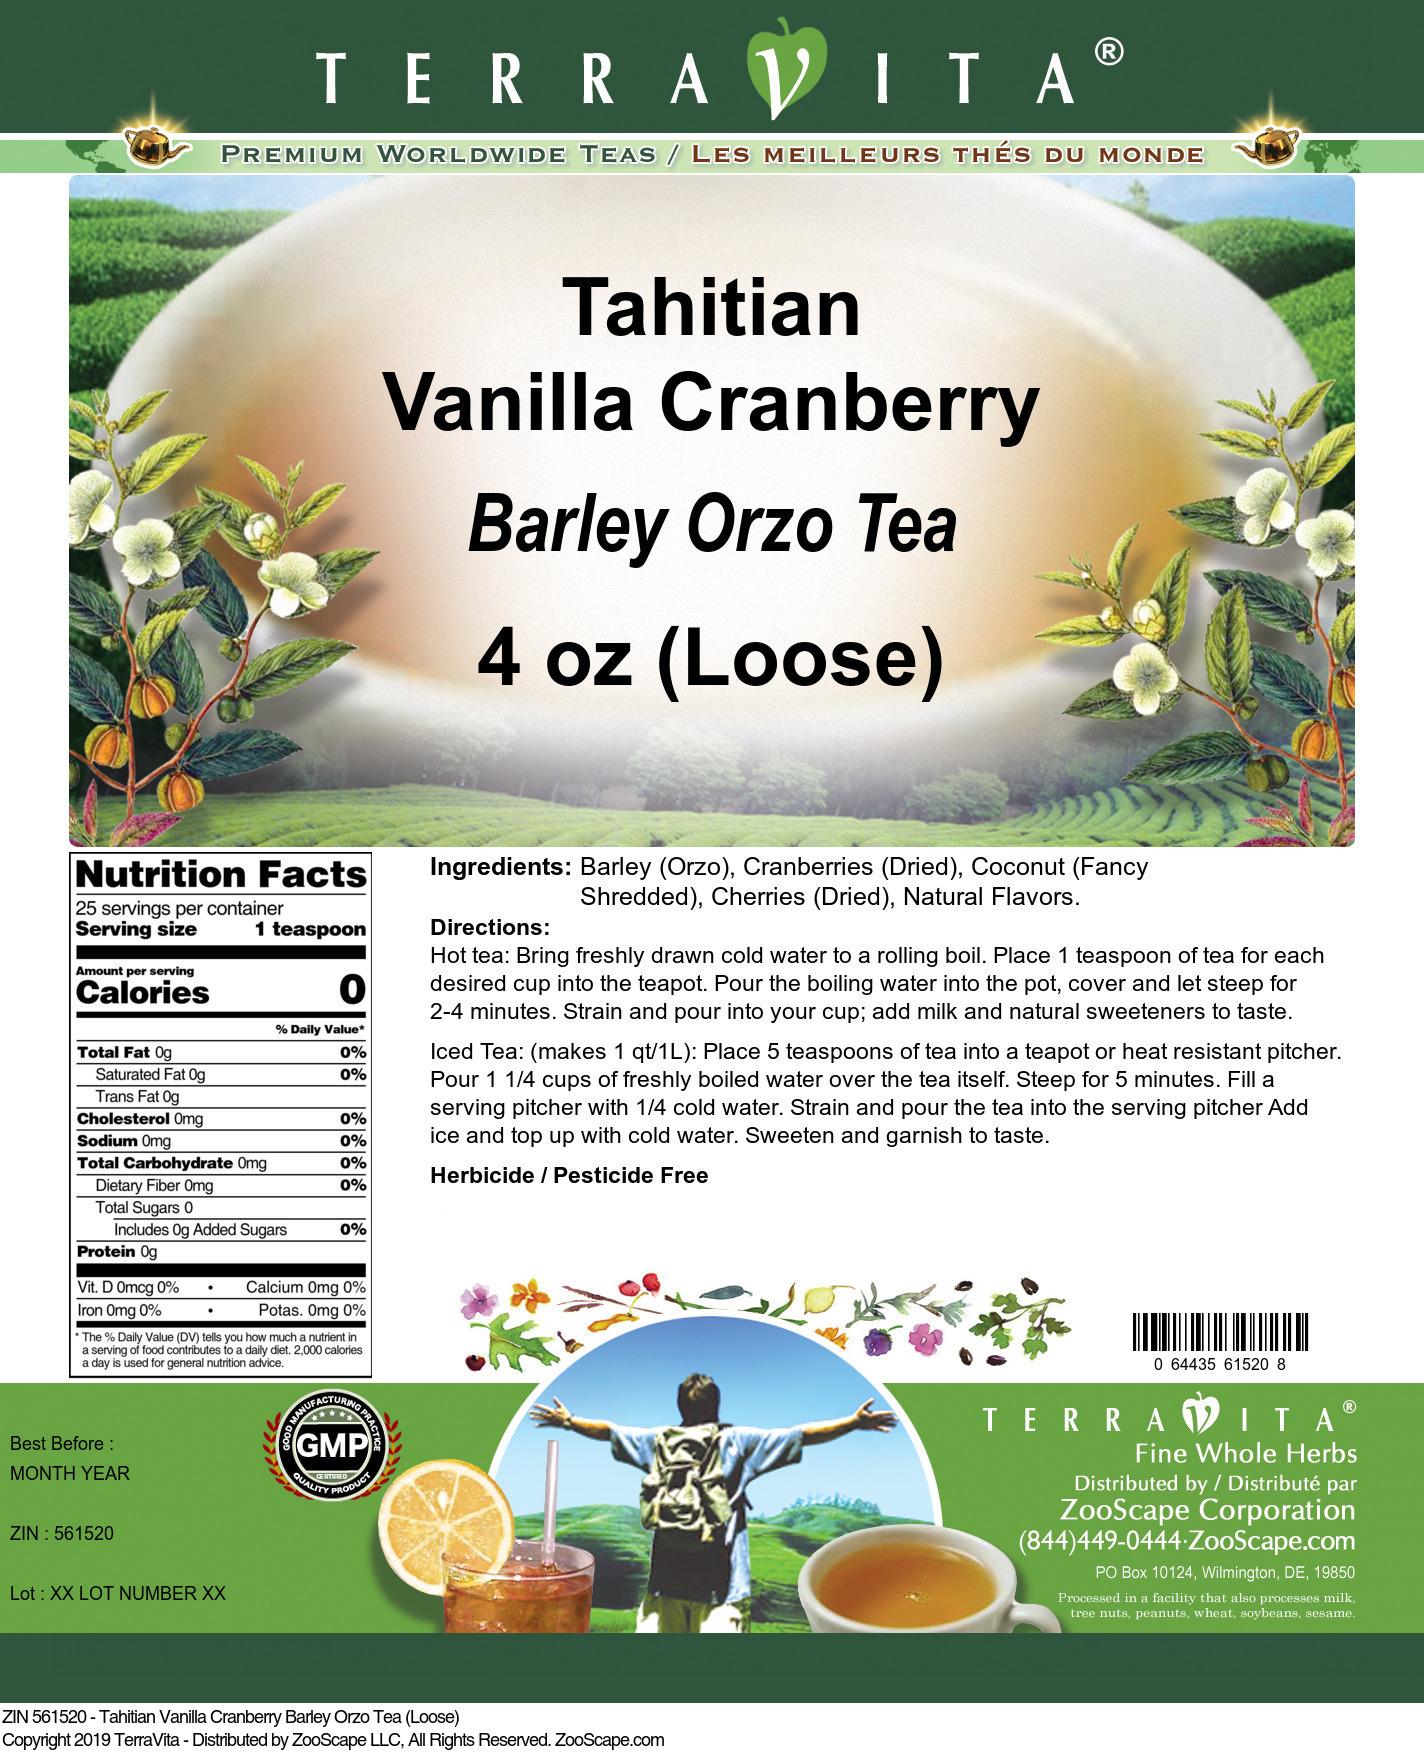 Tahitian Vanilla Cranberry Barley Orzo